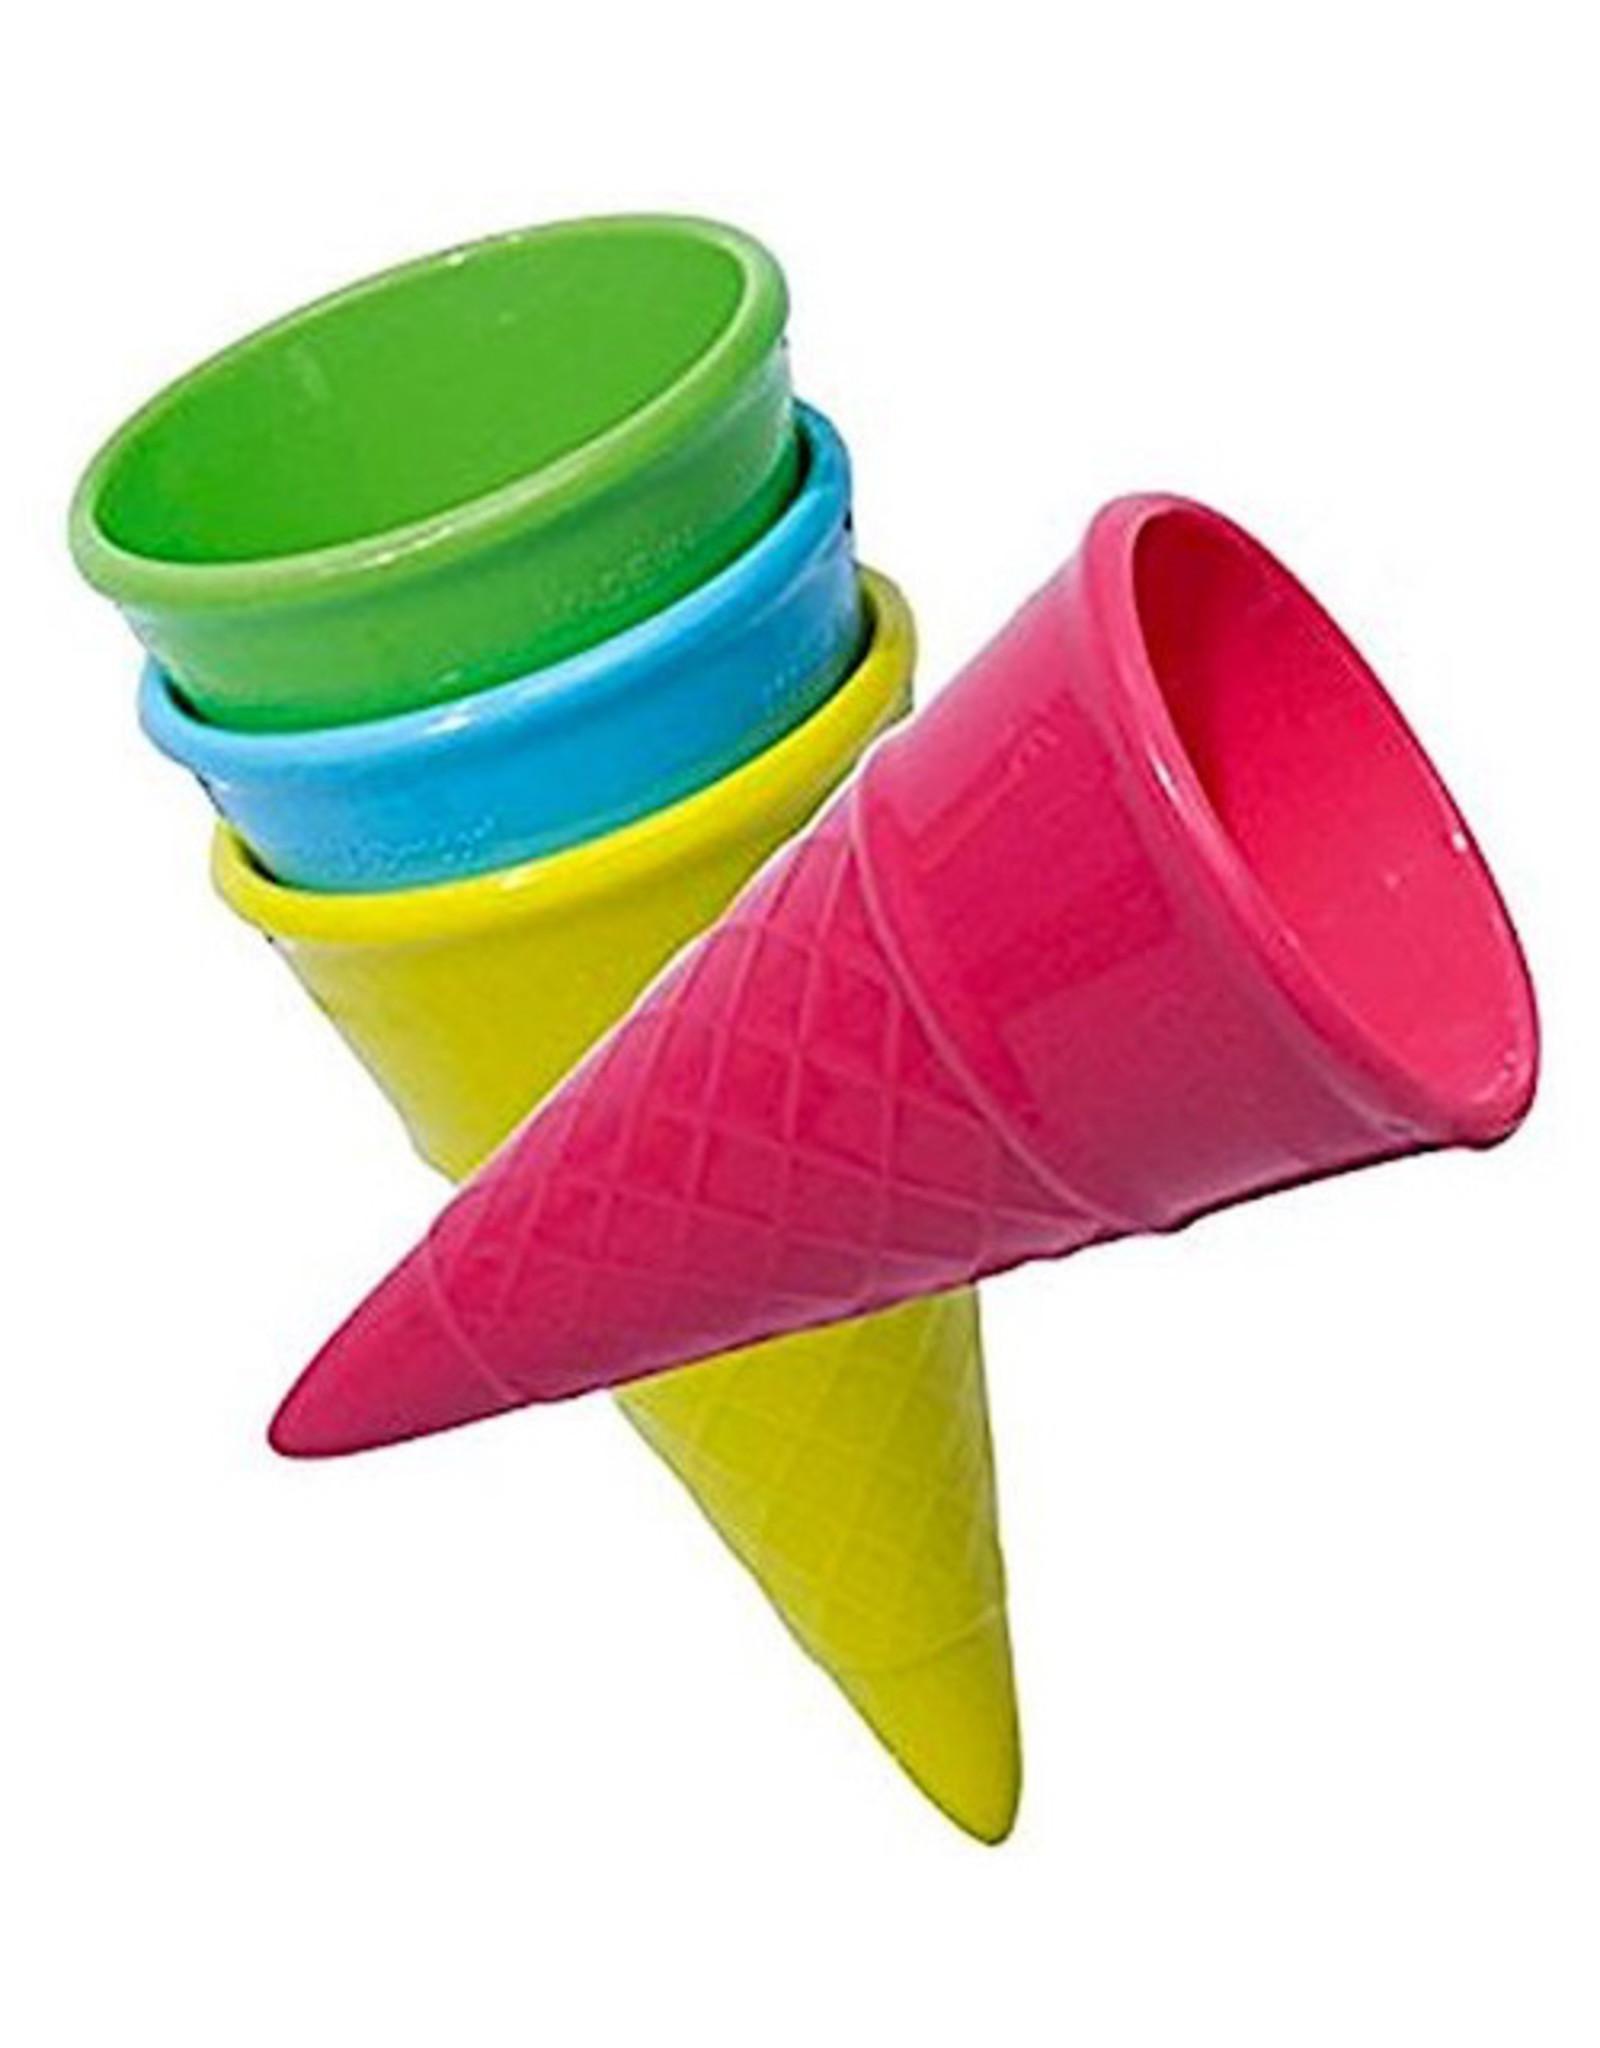 Ice Cream - Duo in net